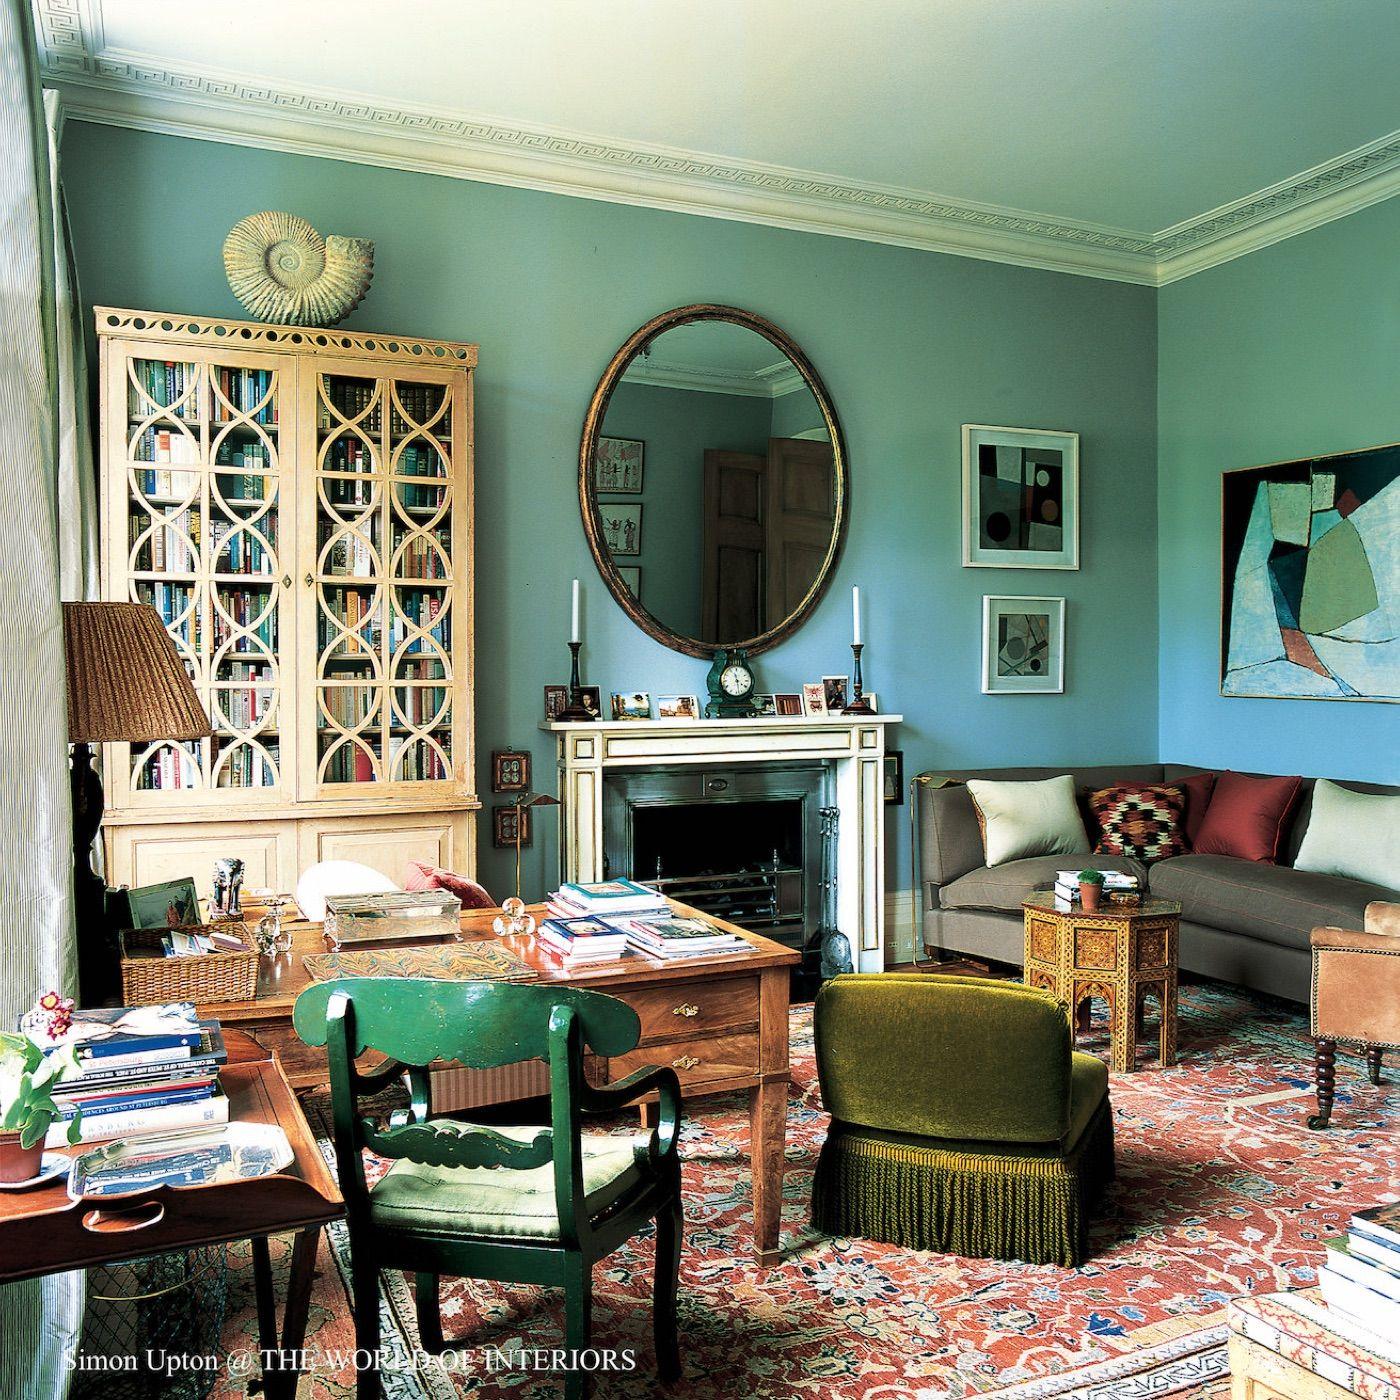 London Apartments Exterior: London Apartment – Sibyl Colefax & John Fowler